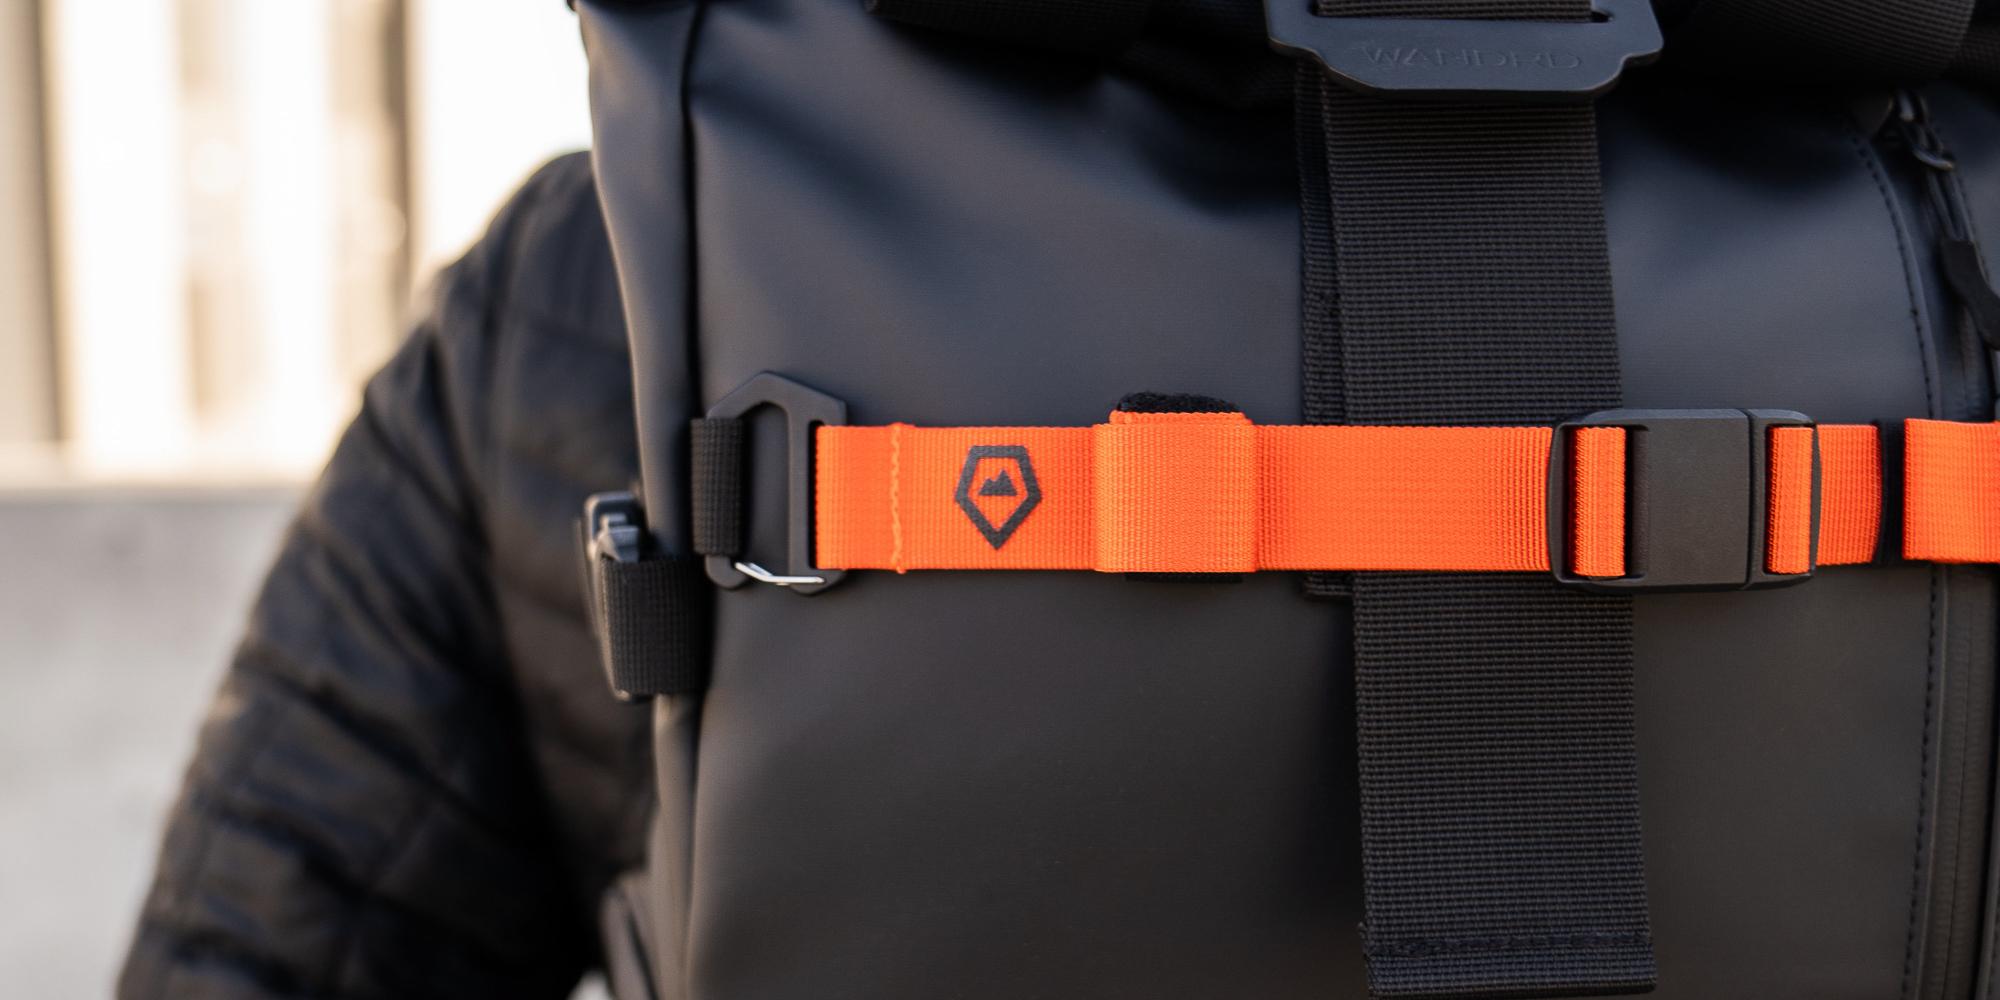 Wandrd All-new Prvke 41 Backpack - Backpack alone is not enough!